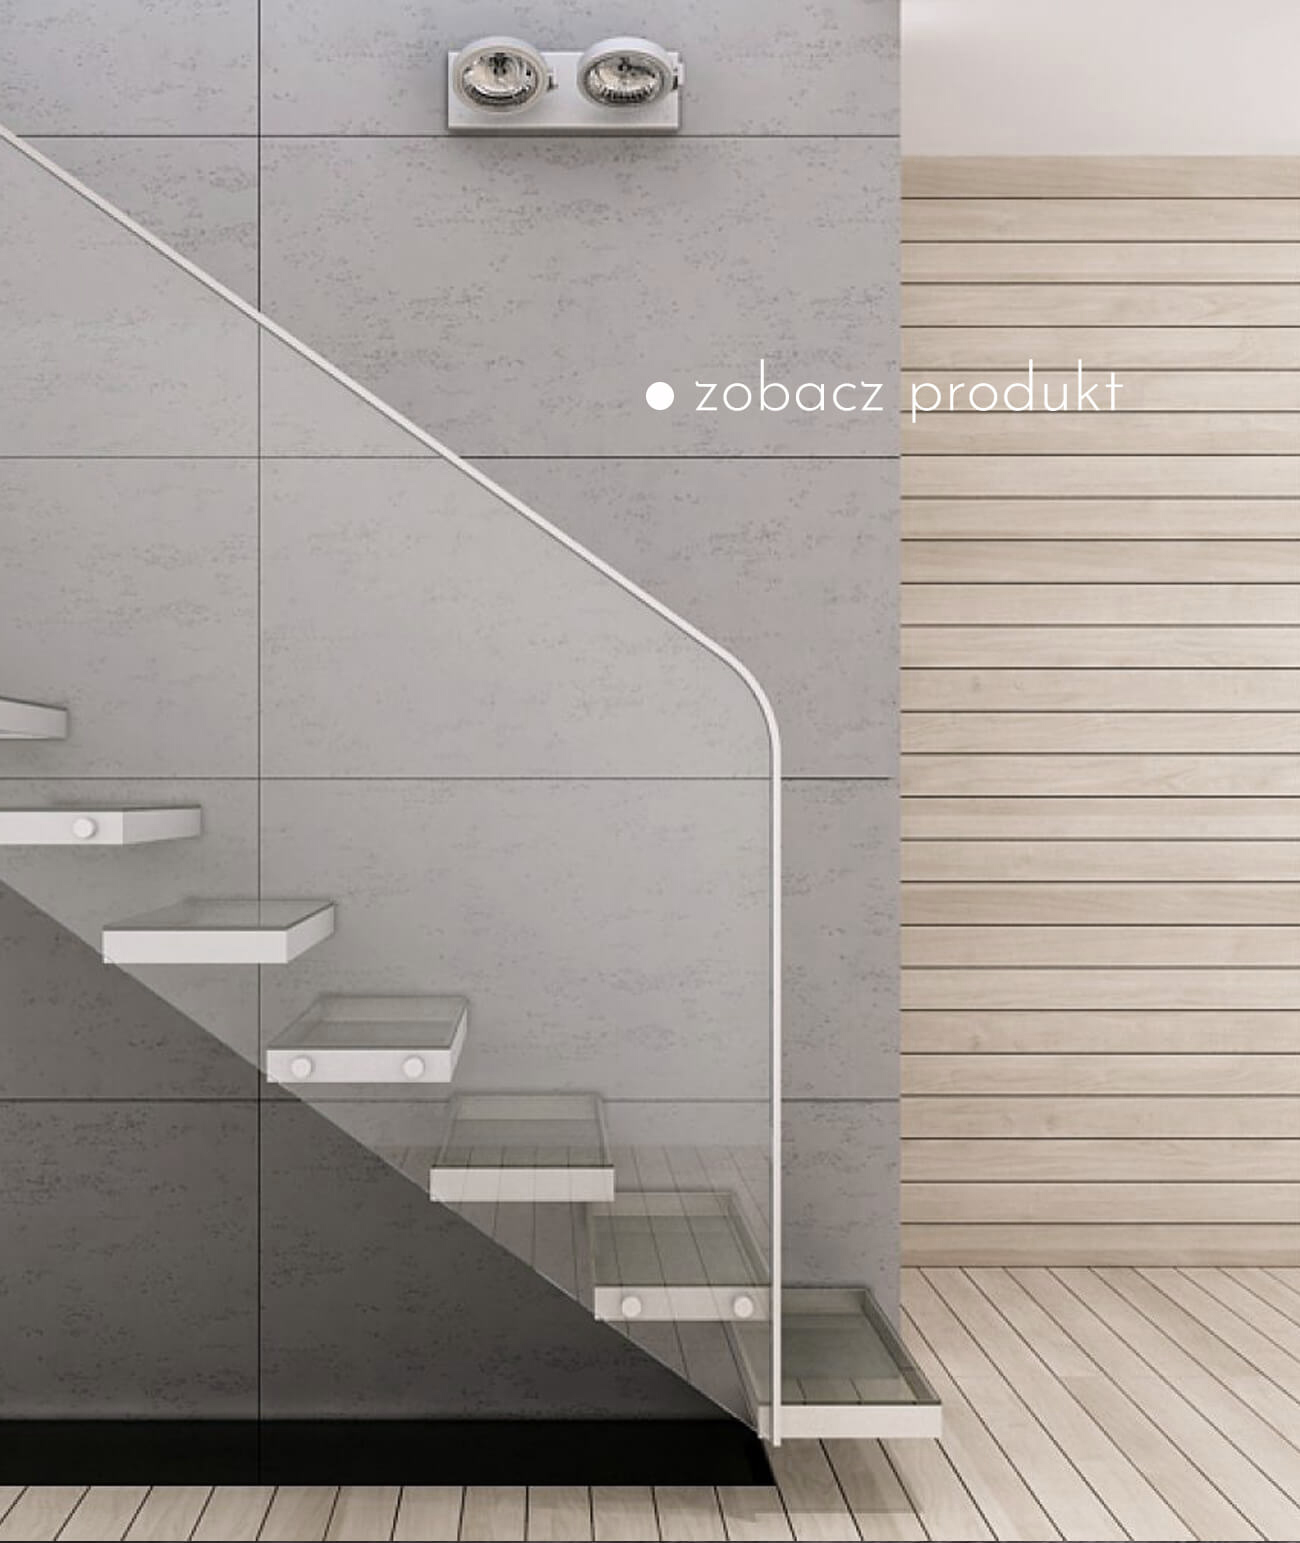 plyty-betonowe-scienne-i-elewacyjne-beton-architektoniczny_171-1246-vt-s95-szary-jasny-golabkowy-plyta-beton-architektoniczny-rozne-wymiary